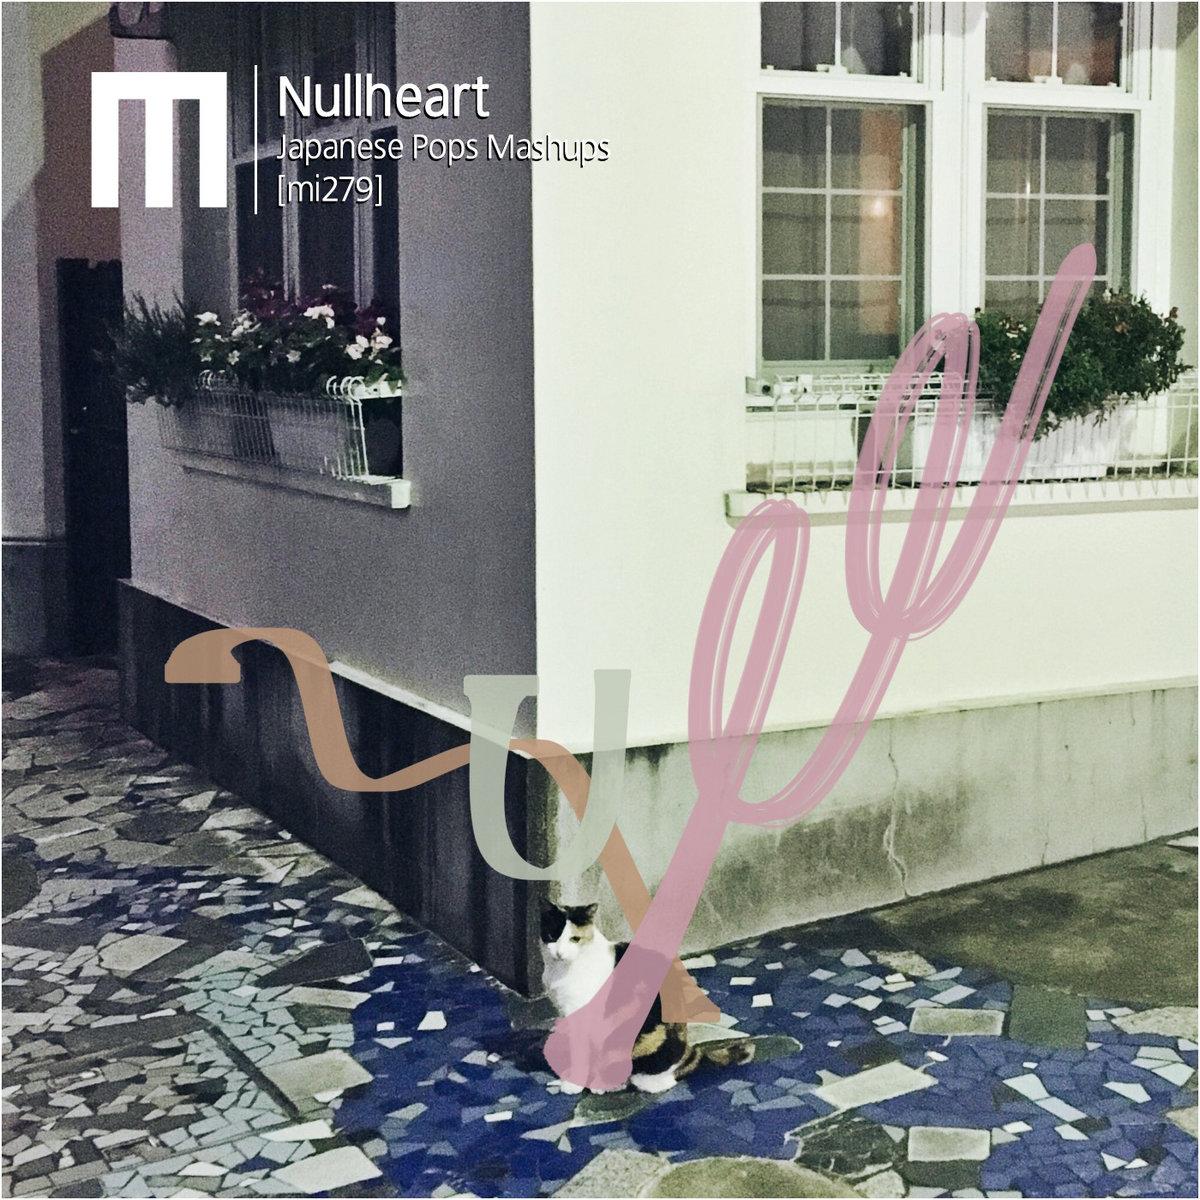 Nullheart – Japanese Pops Mashups